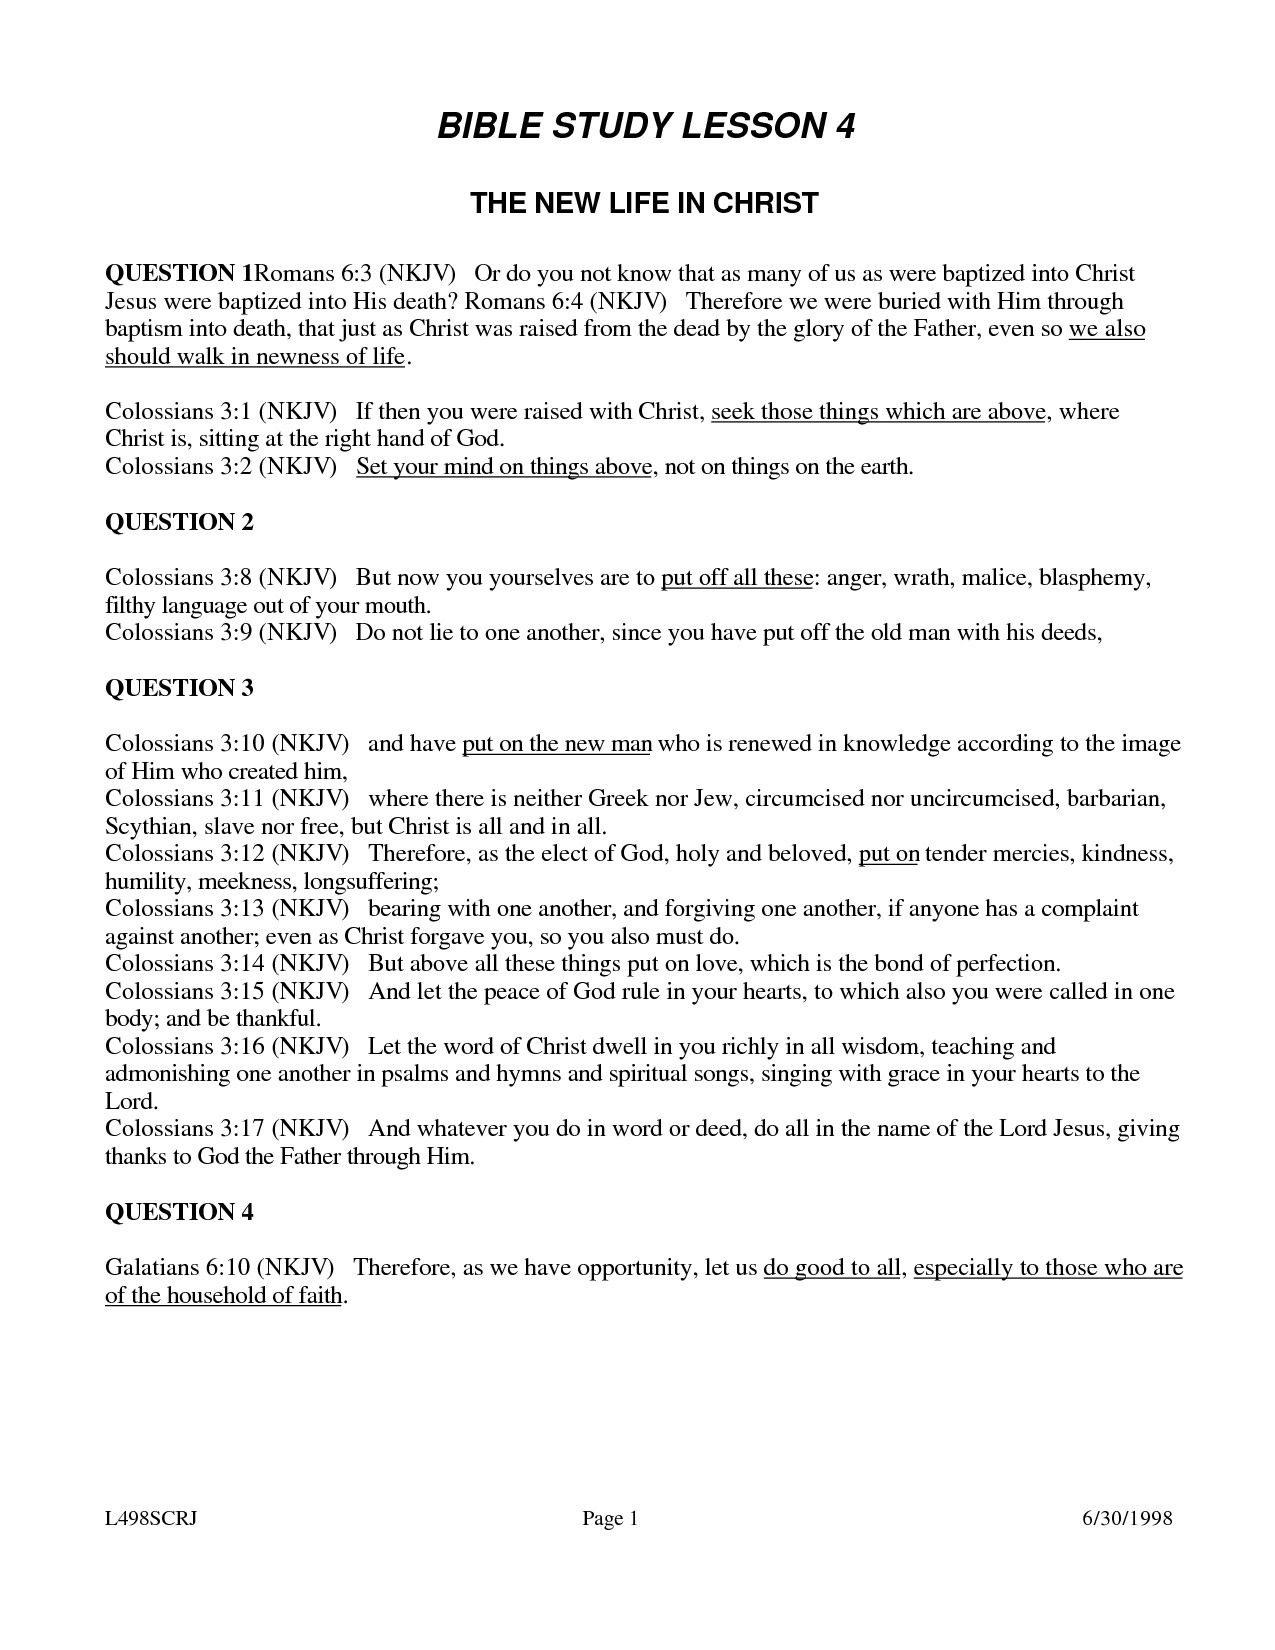 Bible Study Lesson On Contentment Cinemas 93